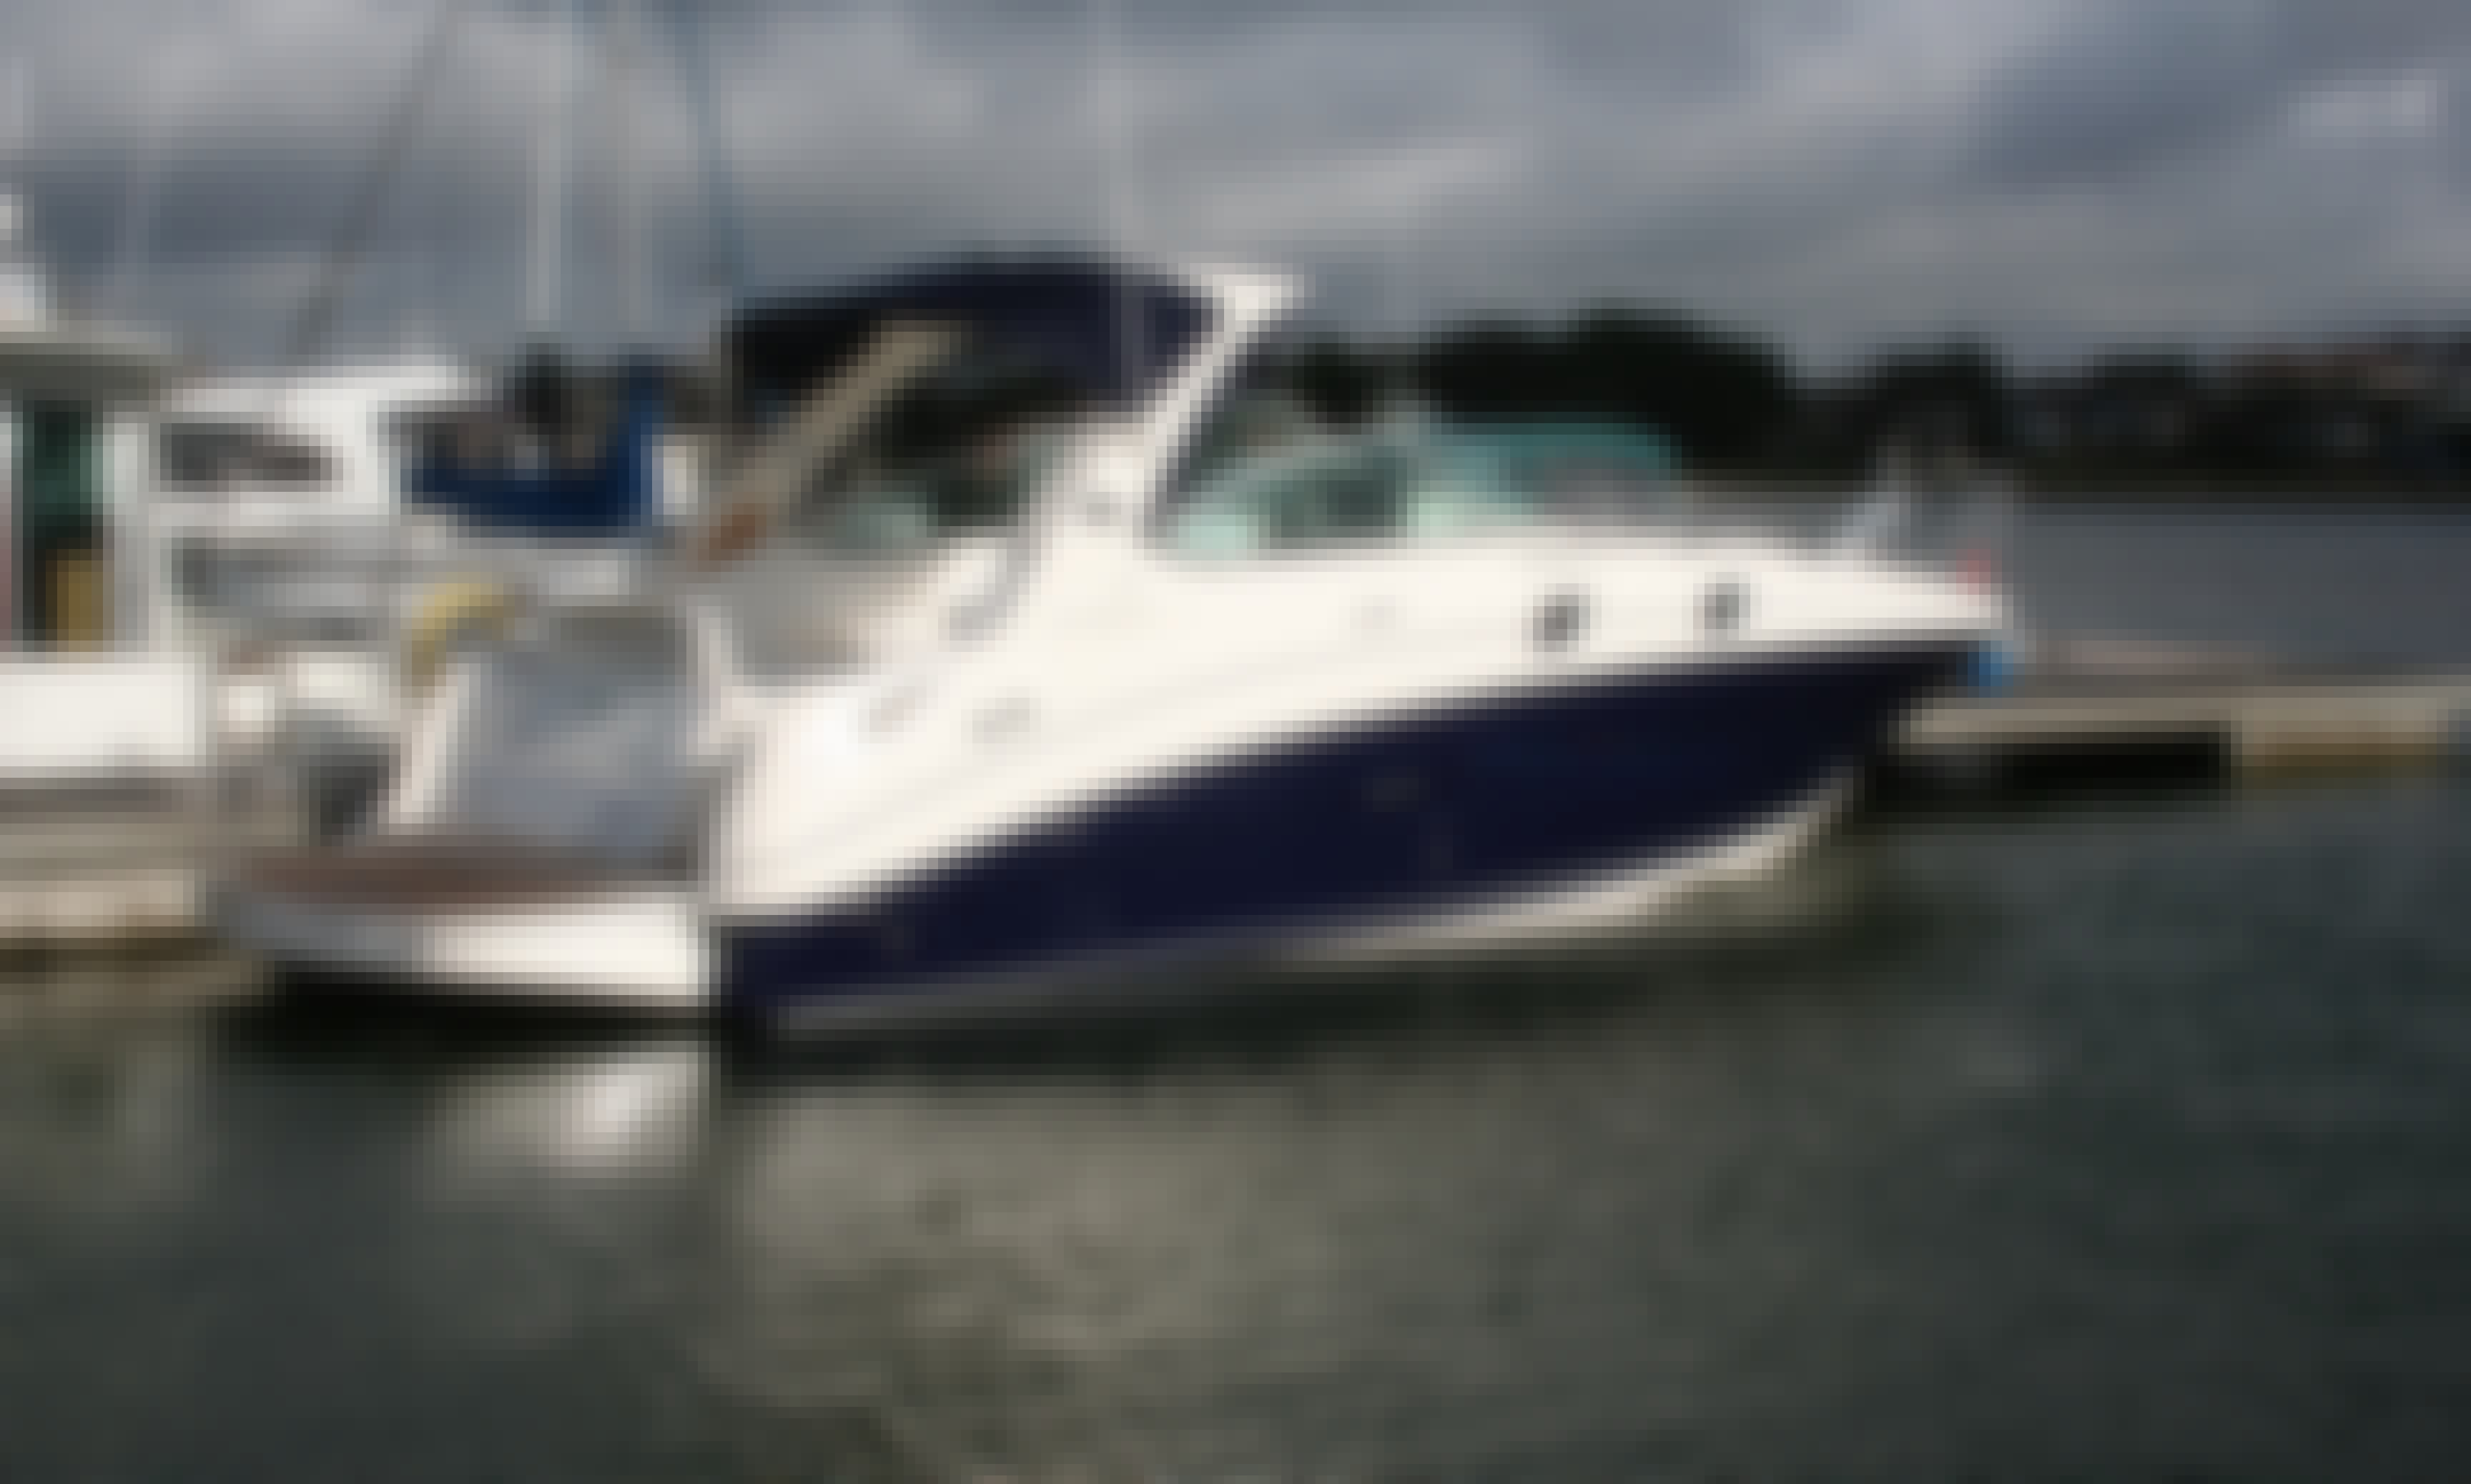 Motor Yacht rental in Sarisbury Green, U.K.